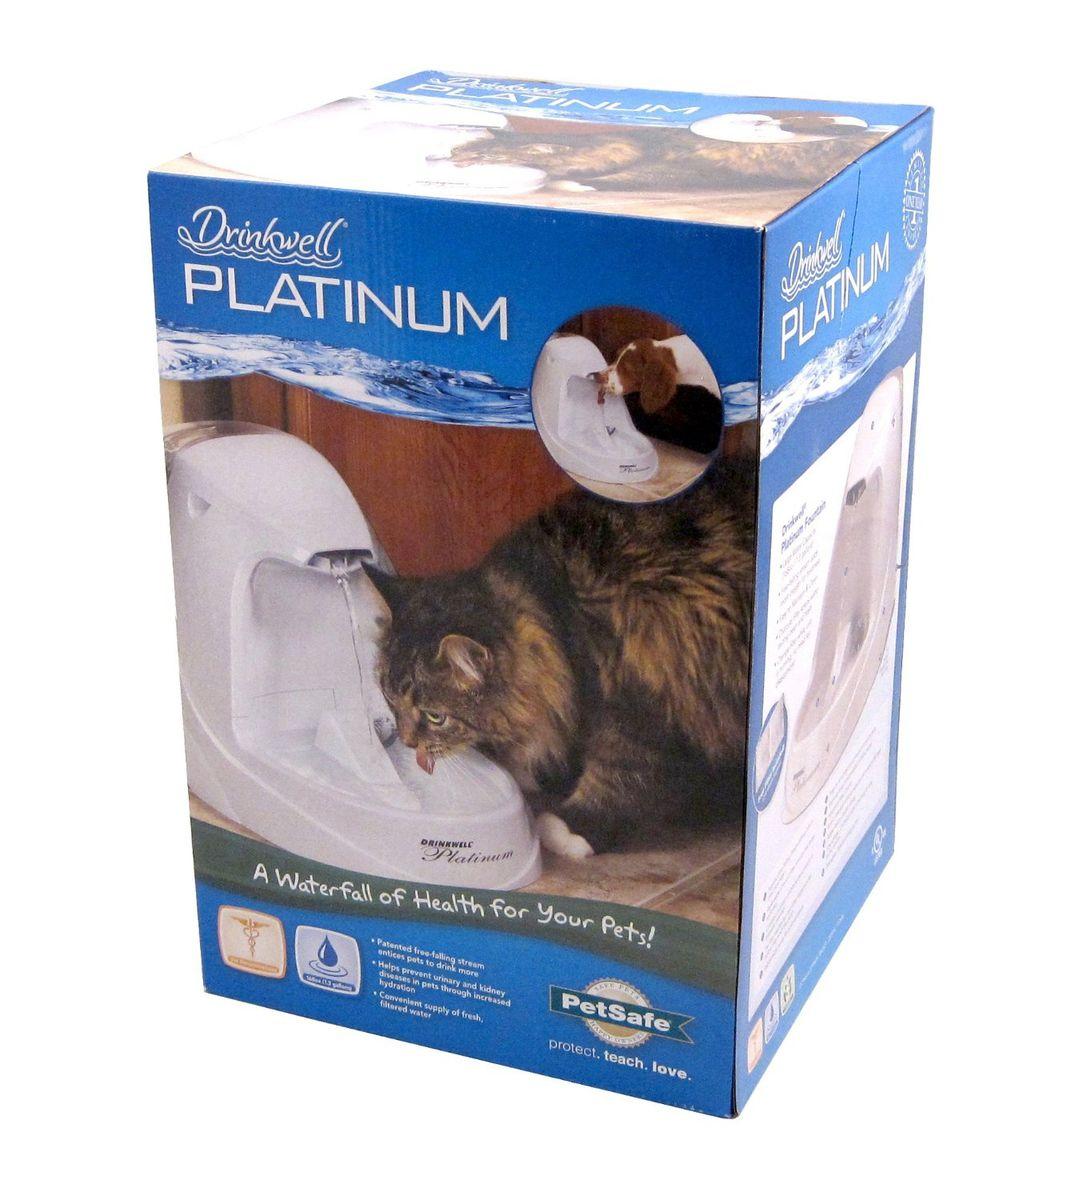 Drinkwell  5 Litre Platinum Pet Fountain